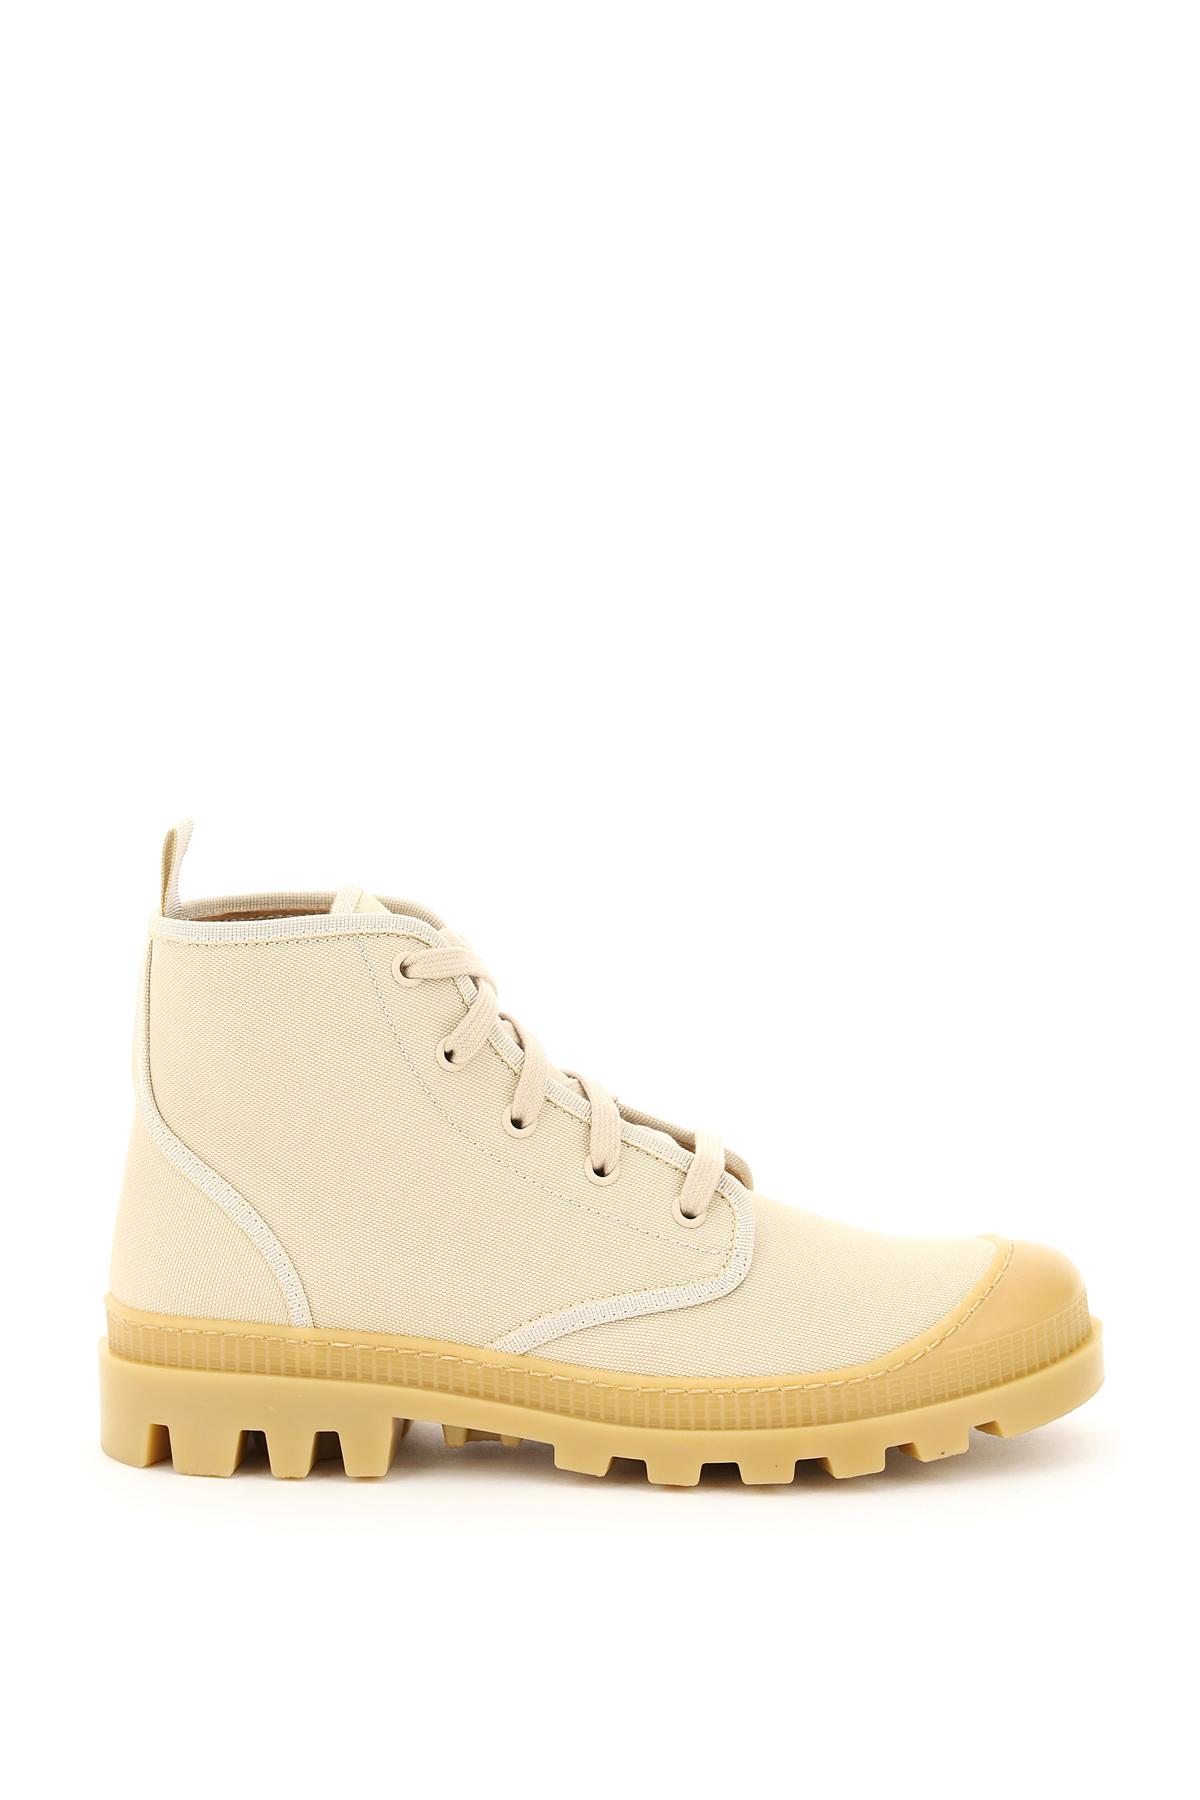 Gia x pernille teisbaek hiking boots perni 09